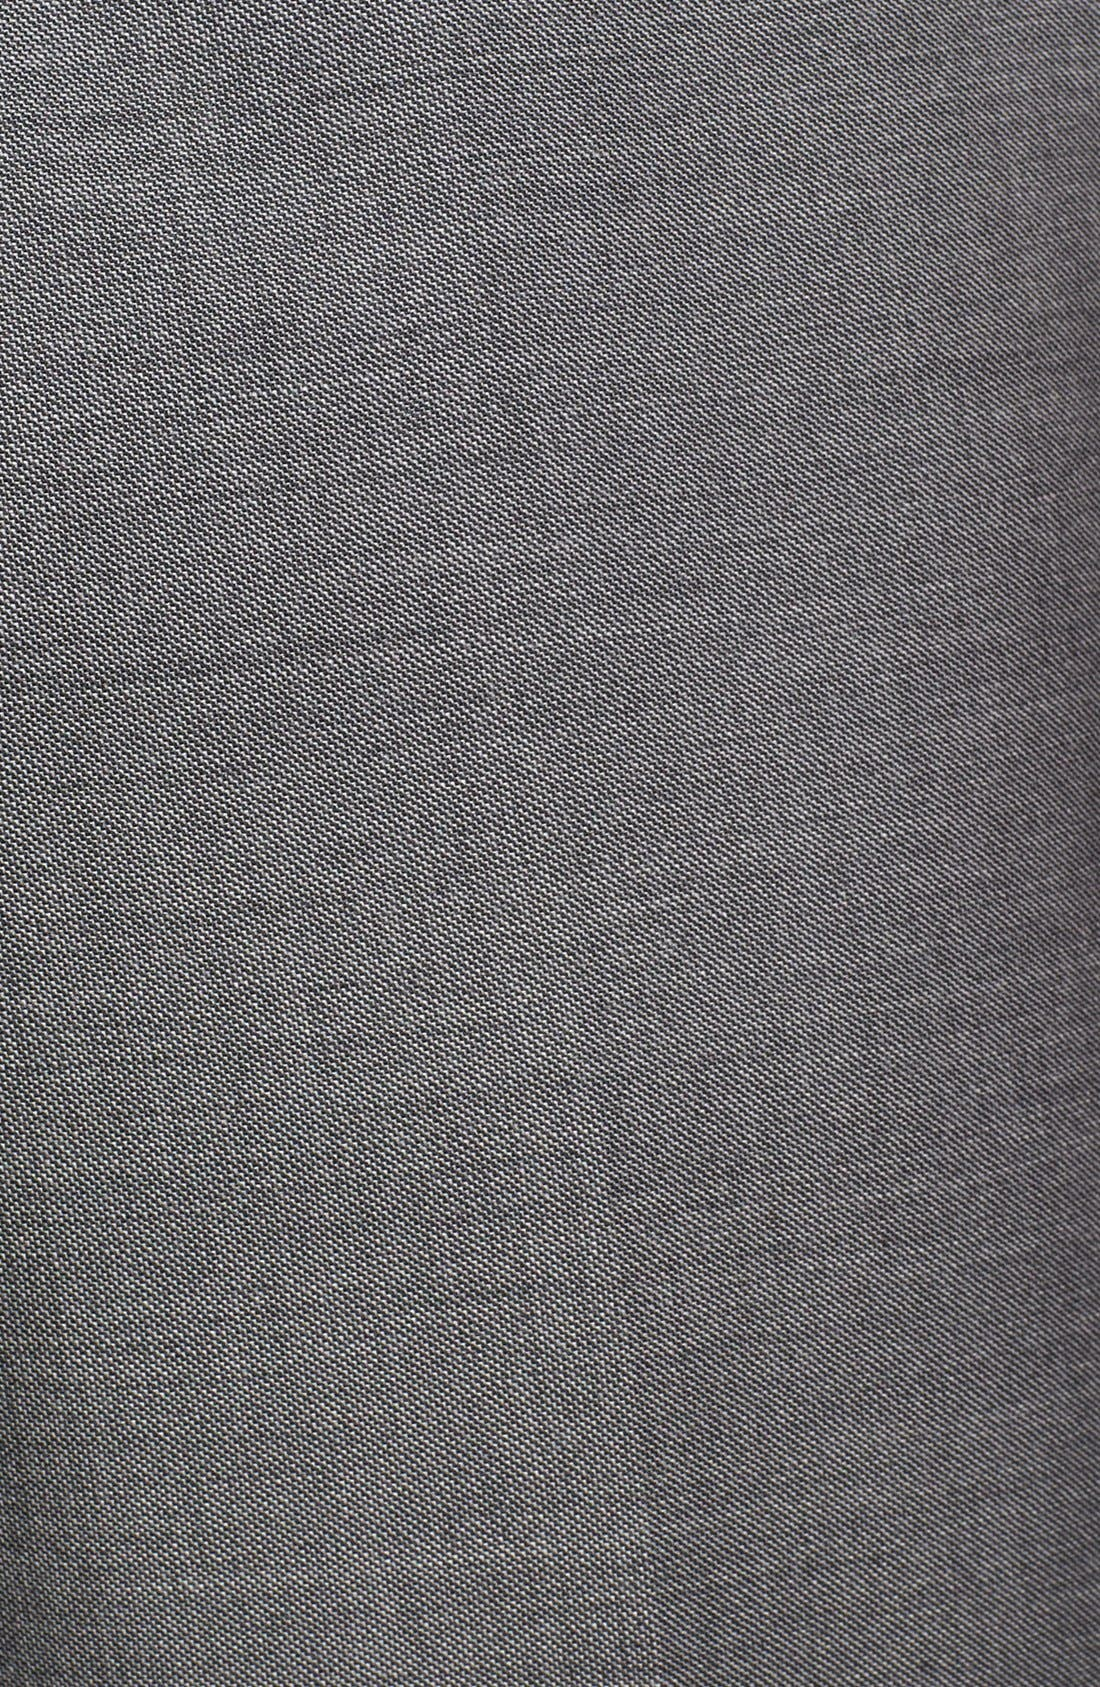 ZZDNUHUGO BOSS,                             BOSS HUGO BOSS 'Sharp' Flat Front Wool Trousers,                             Alternate thumbnail 5, color,                             001